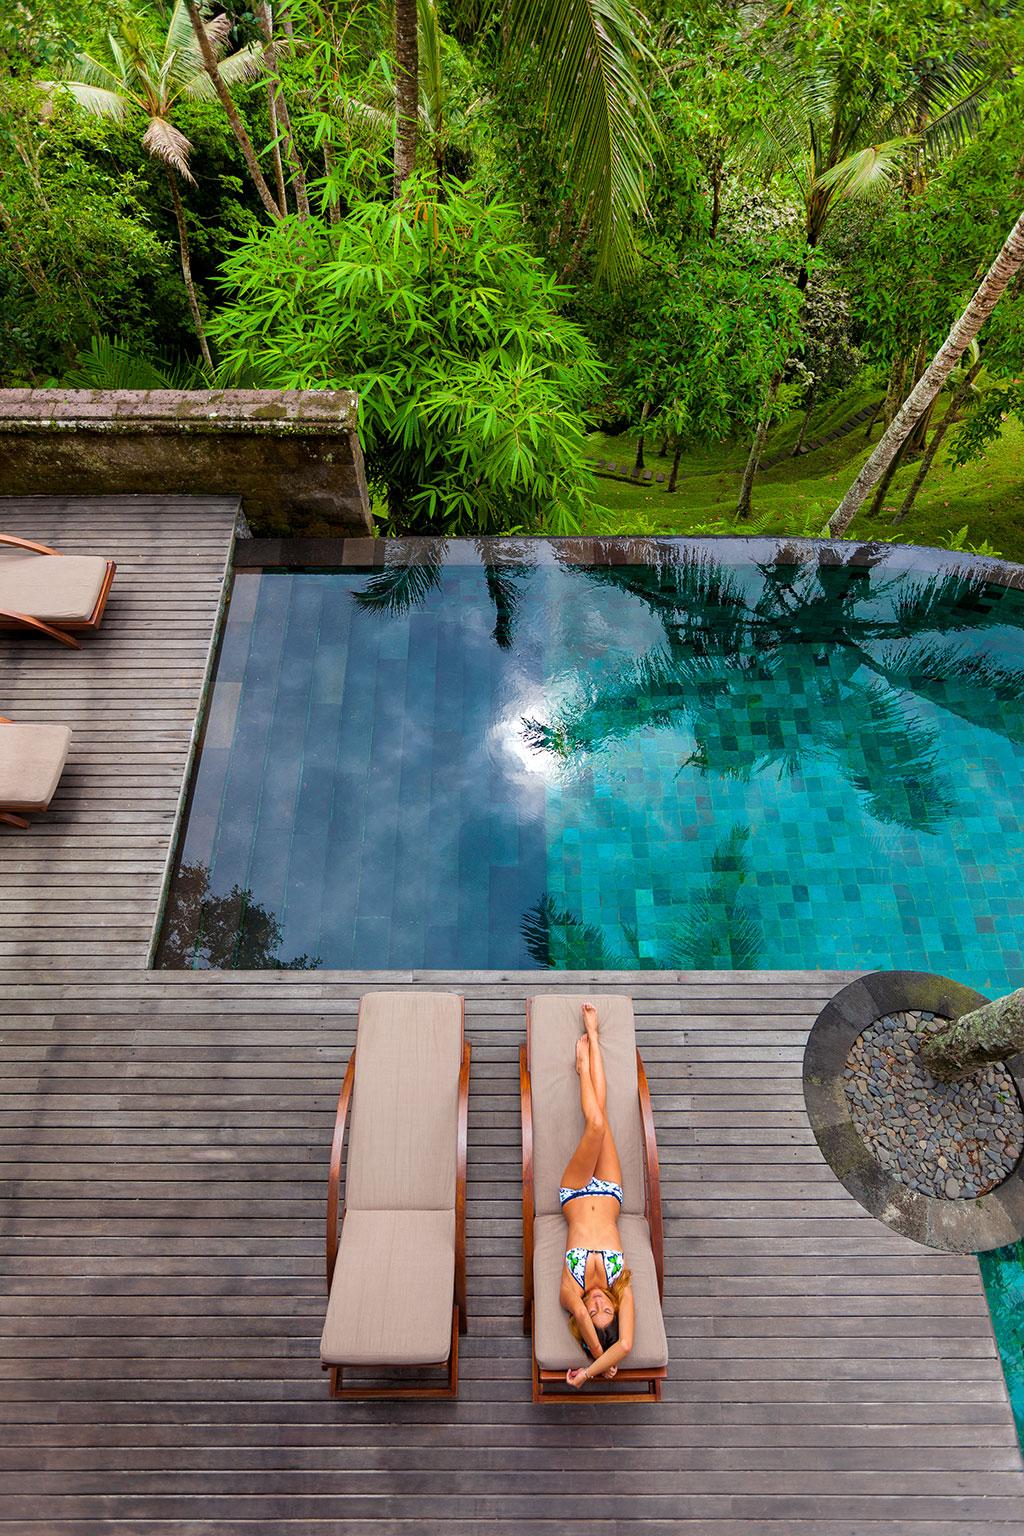 Casa con piscina en mitad de la selva for Piscina la selva